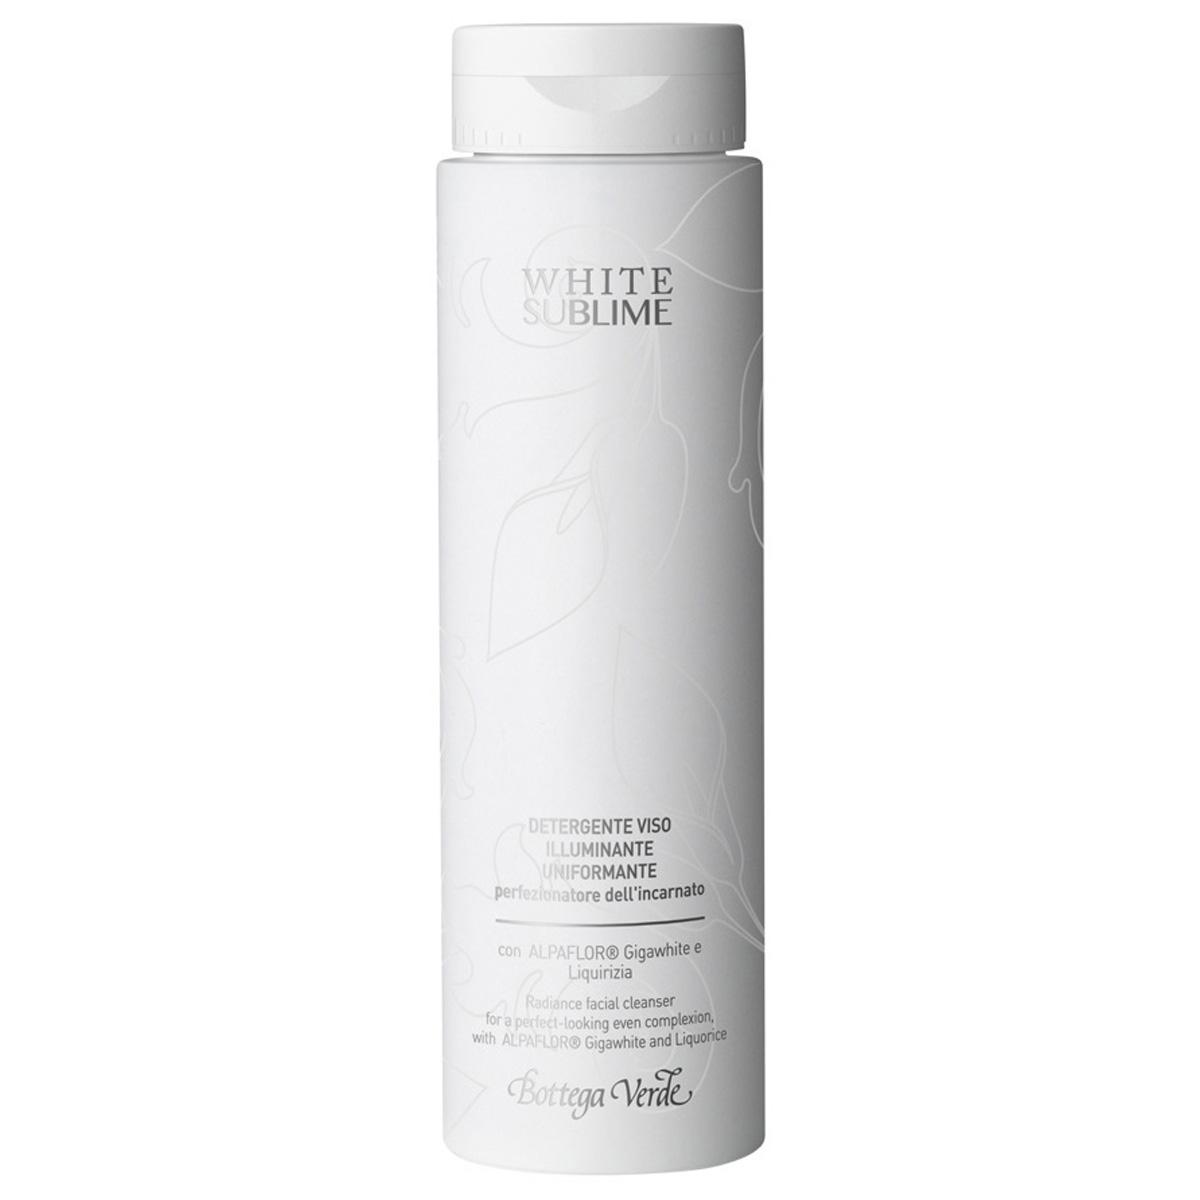 White Sublime - Demachiant Pentru Fata Iluminanat  Uniformizant  Cu Alpaflor® Gigawhite Si Lemn Dulce